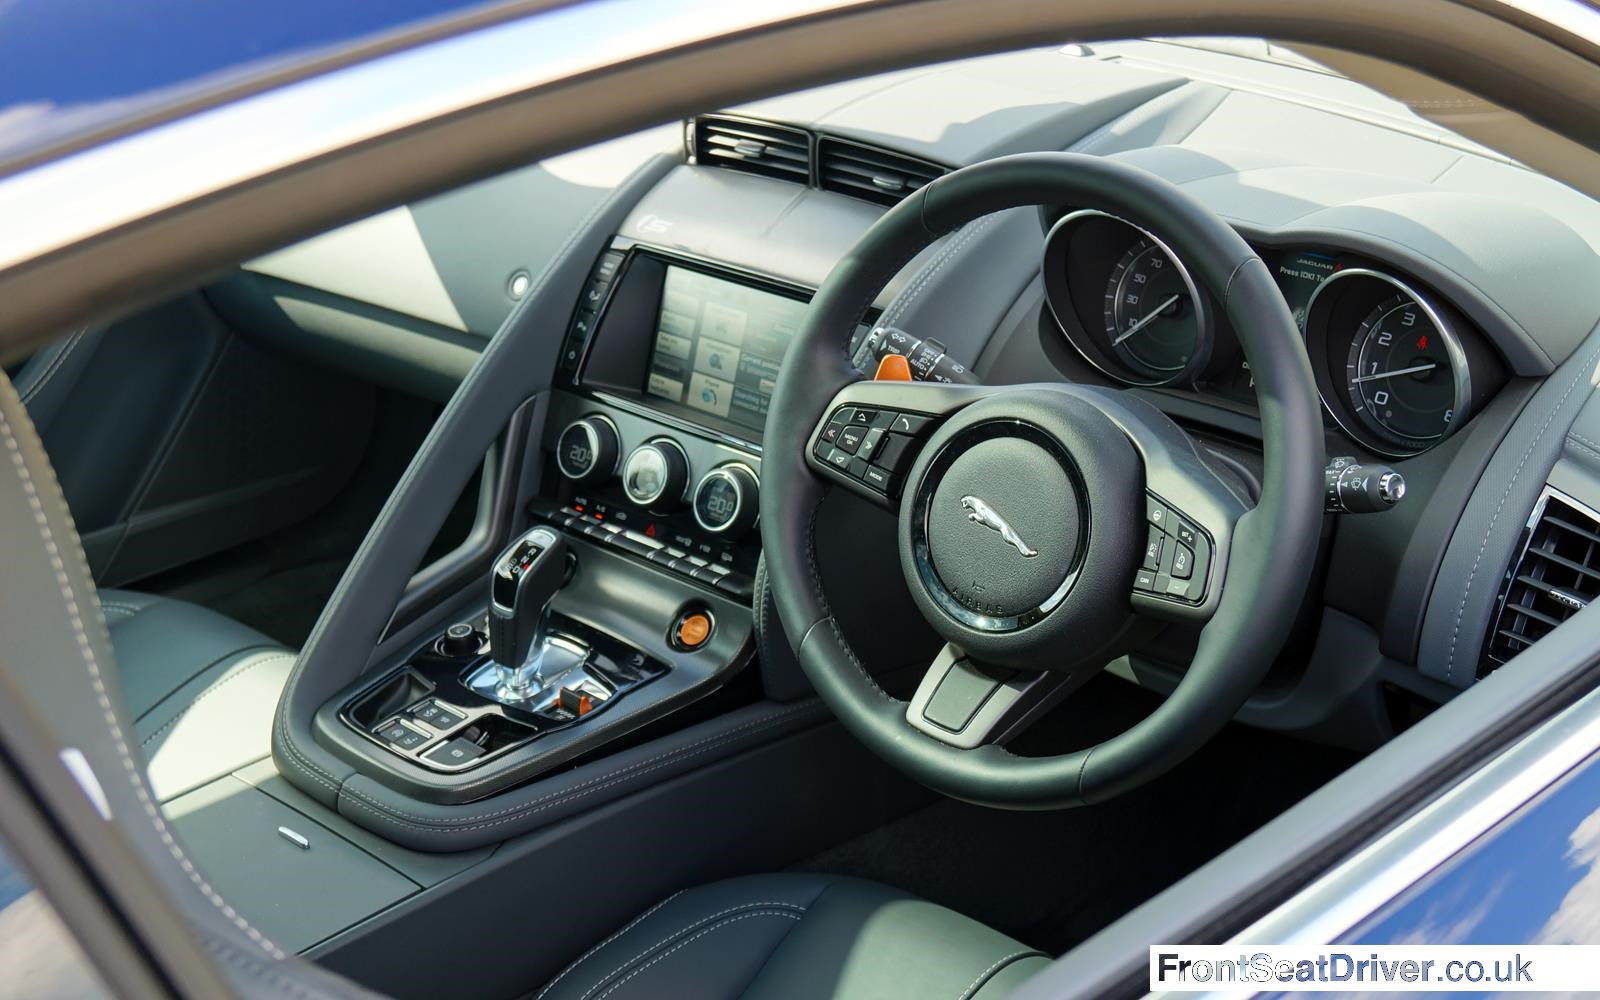 Jaguar F-Type V6 S Coupe2014 Interior Phil Huff FrontSeatDriver.co.uk